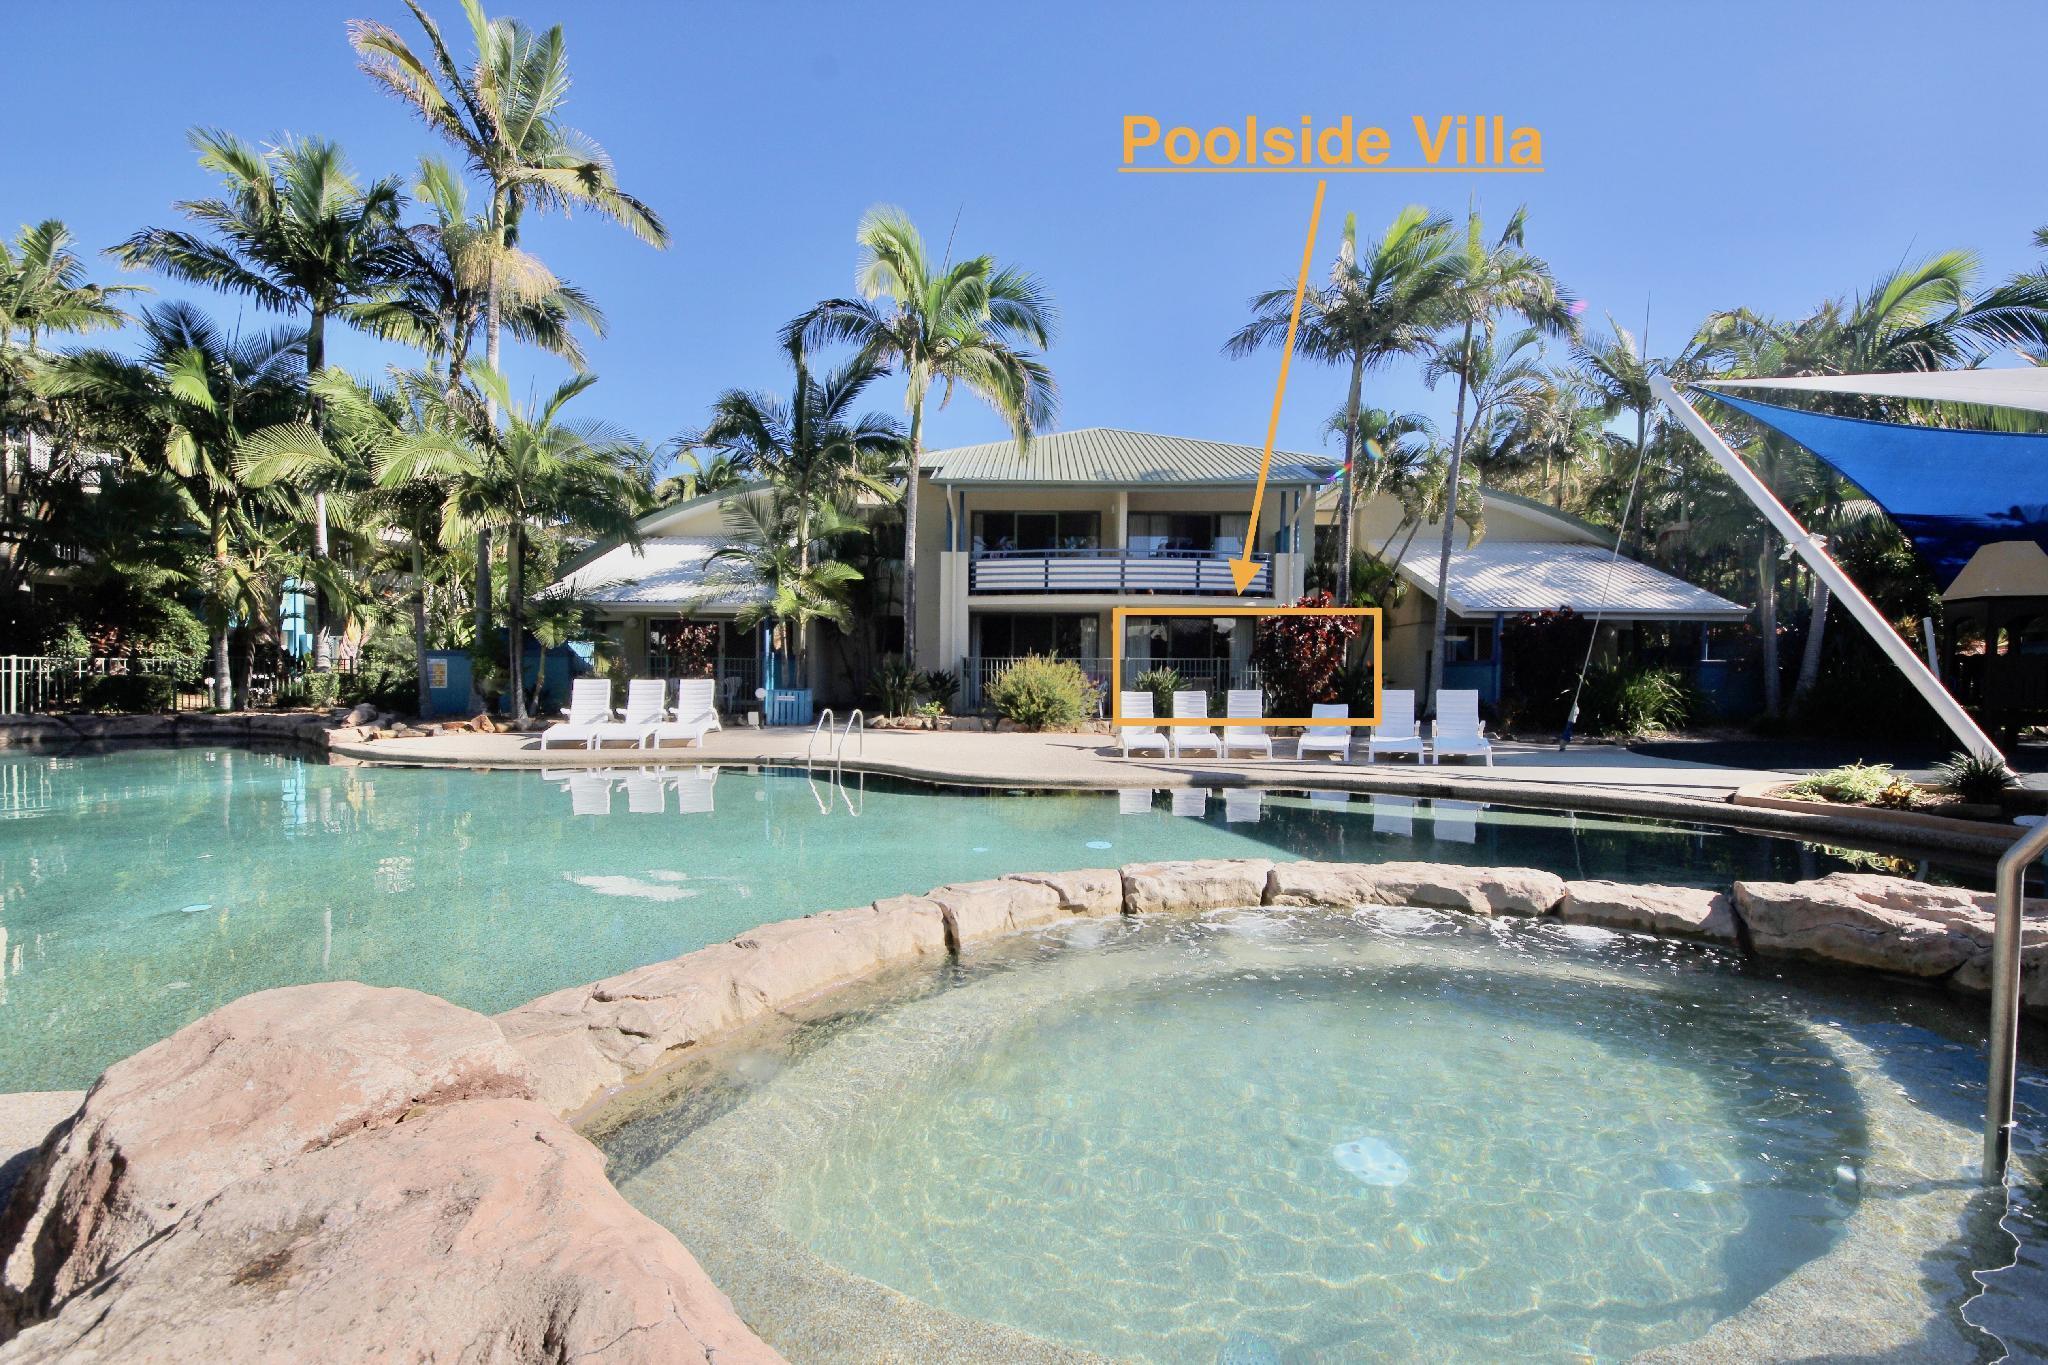 Diamond Beach Resort Poolside Villa 83